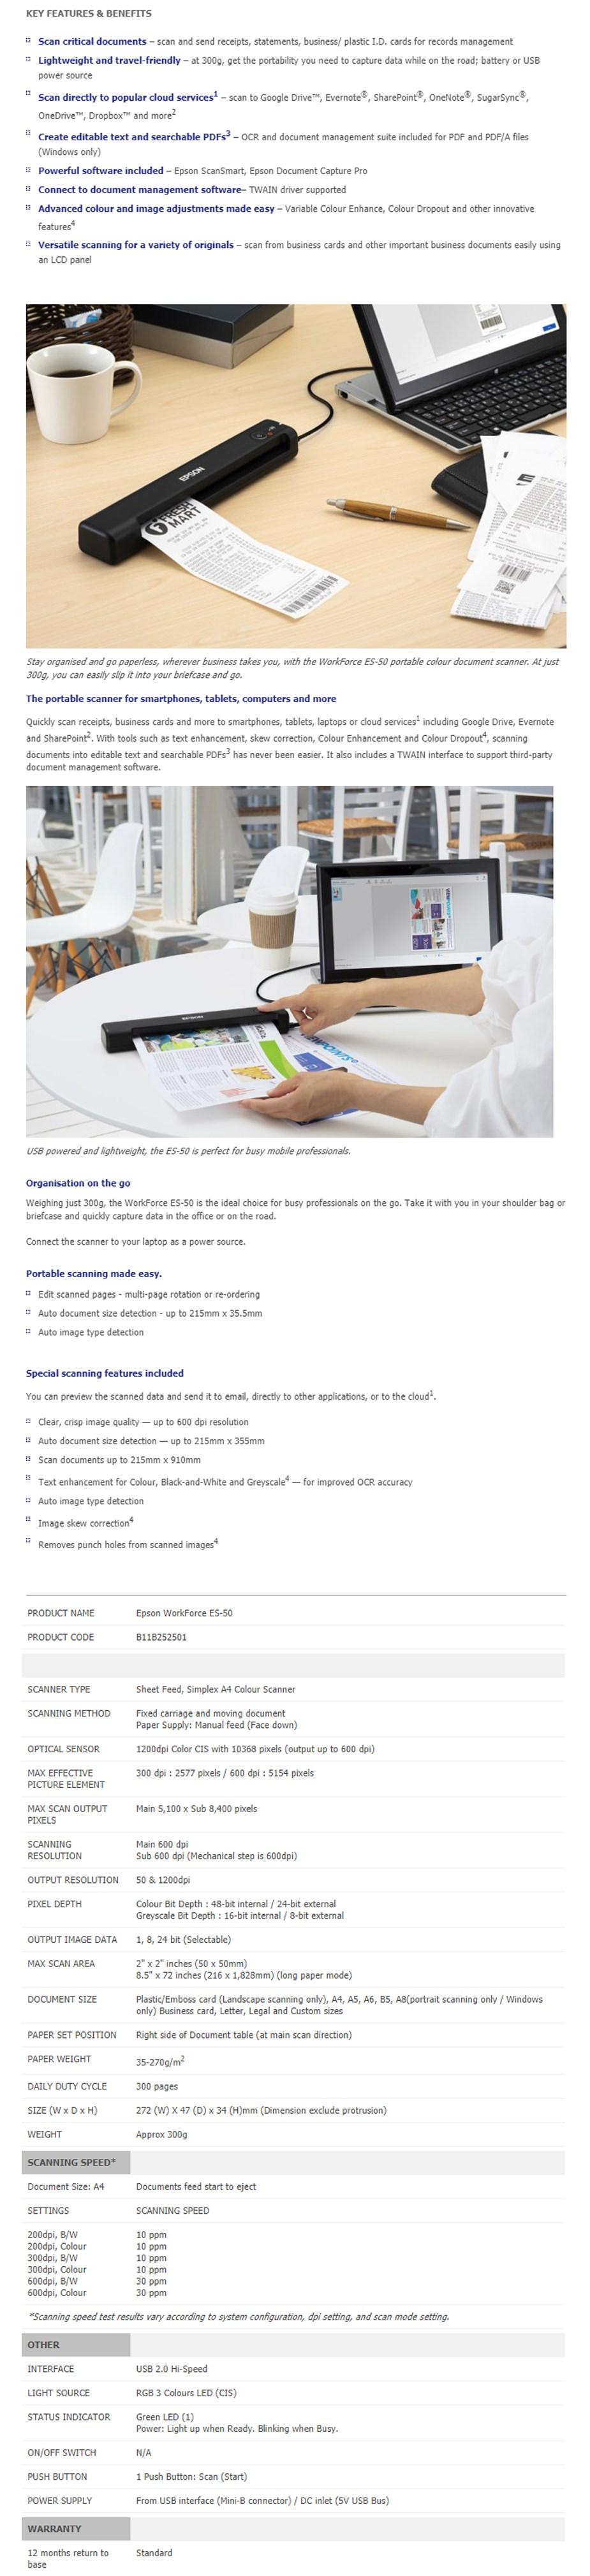 Epson WorkForce ES-50 Portable A4 Colour Photo Scanner - Overview 1